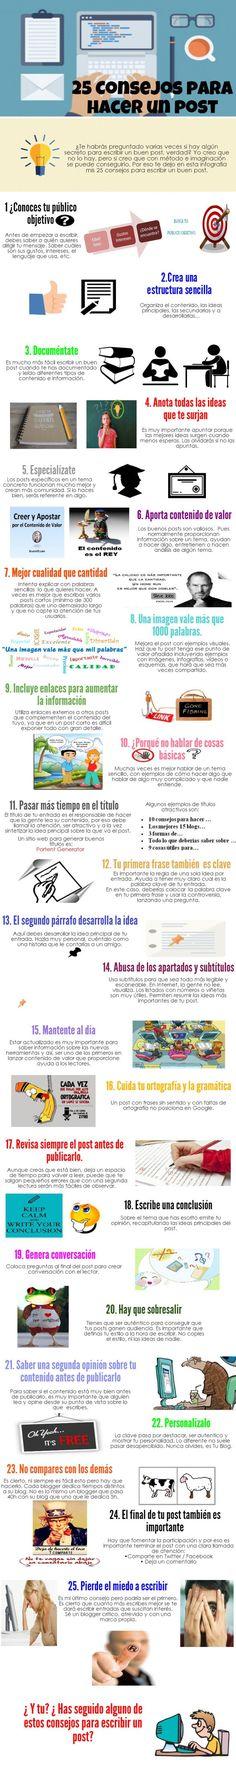 25 consejos para hacer un post #infografia #socialmedia